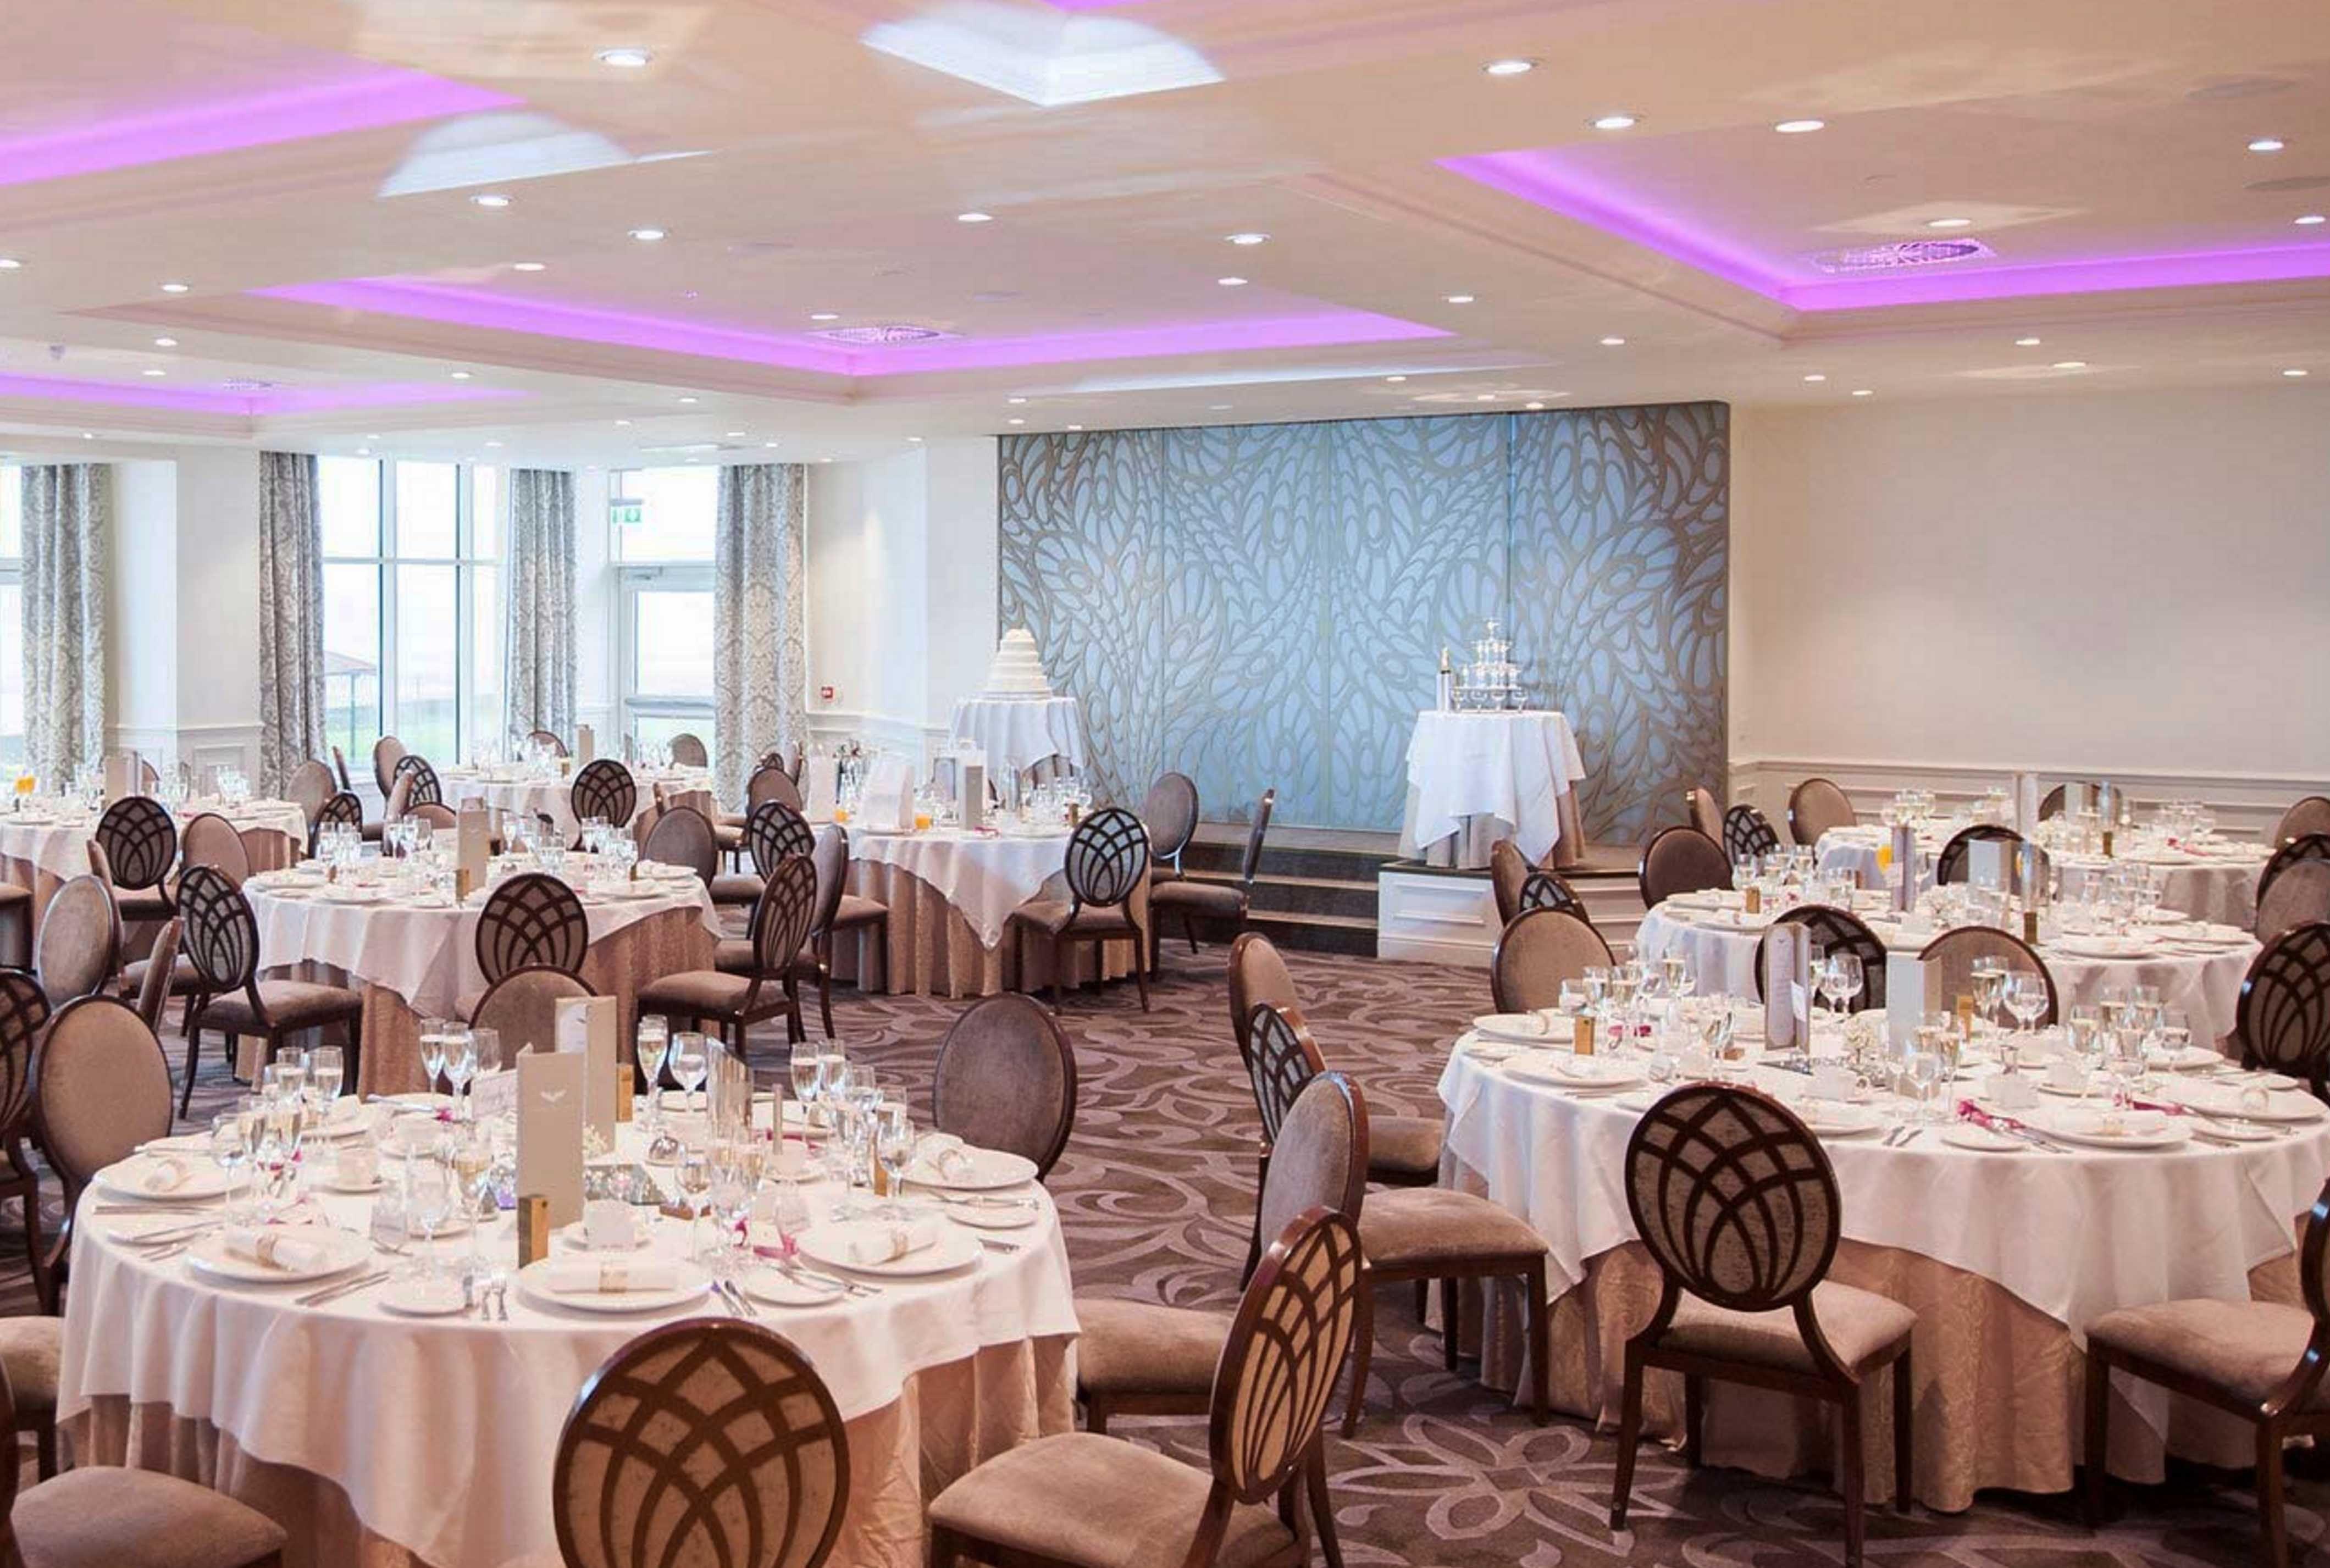 Laser Cut Screens And Sliding Doors Wedding Venue Seamill Hydro Hotel Scotland Dragonfly Design By Miles Lincoln Milesandlincoln: Cu New York Wedding Venue At Reisefeber.org